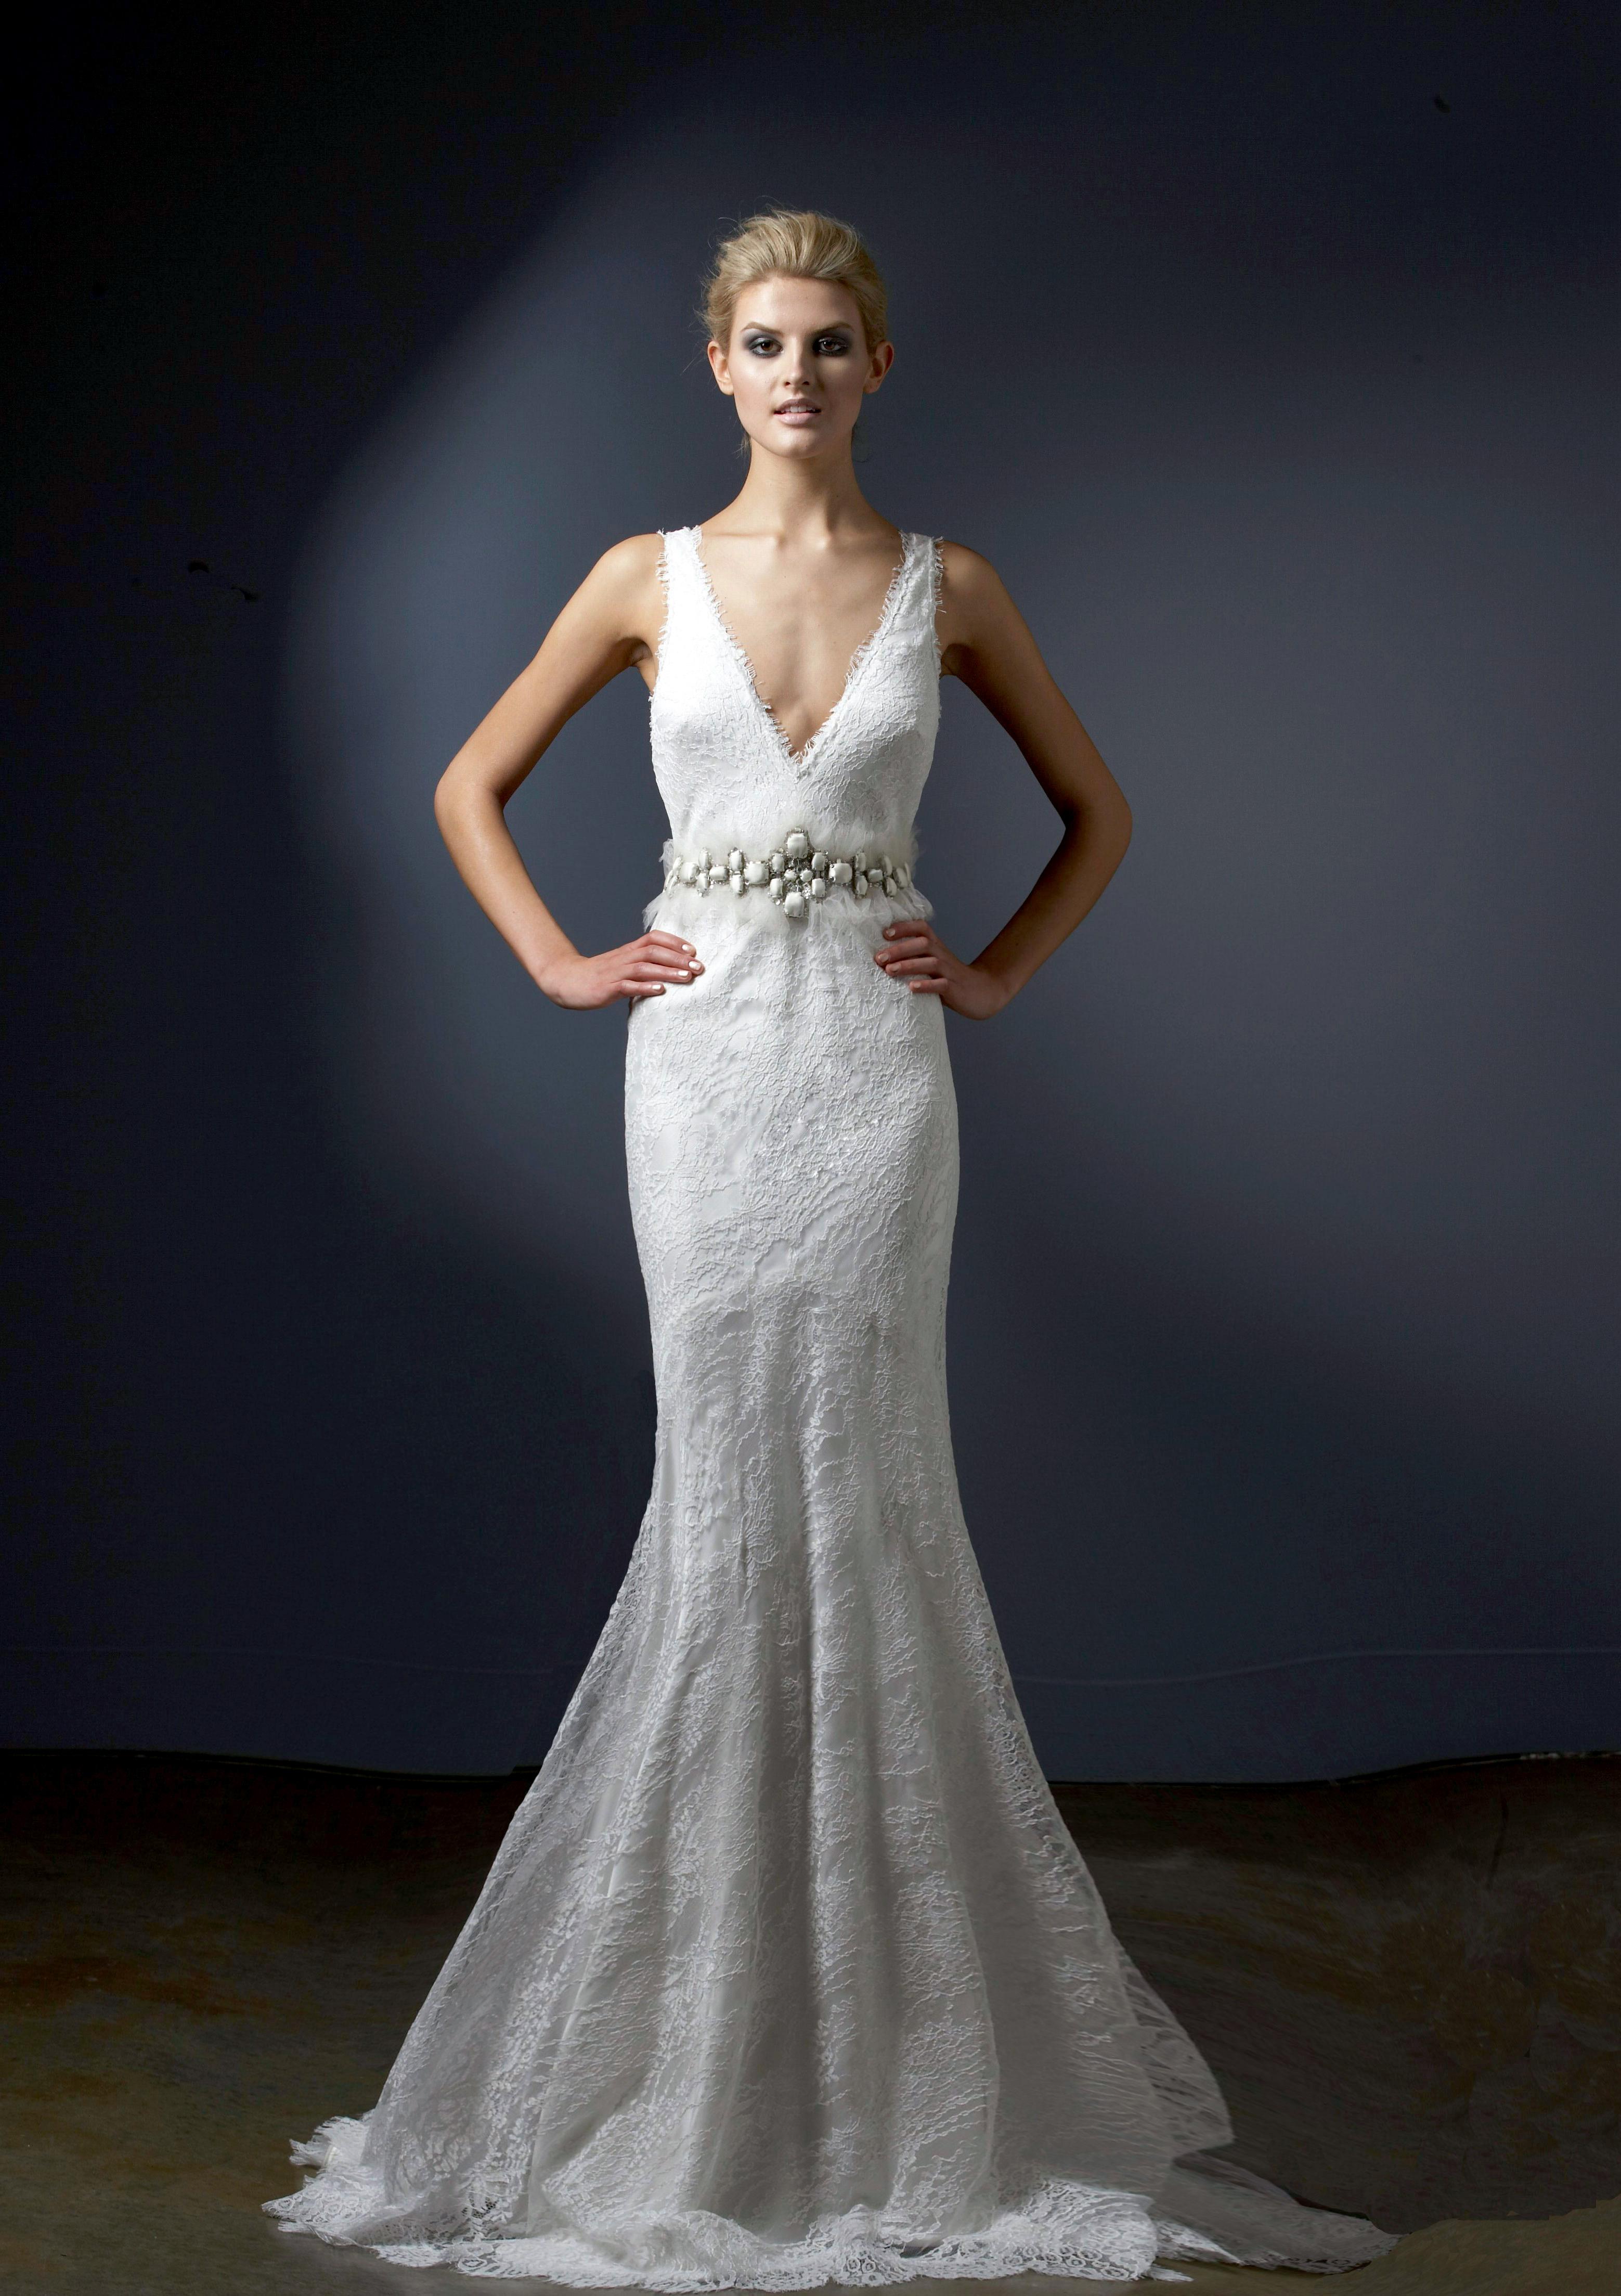 Bridal gown designer Selia Yang- bridal gown.